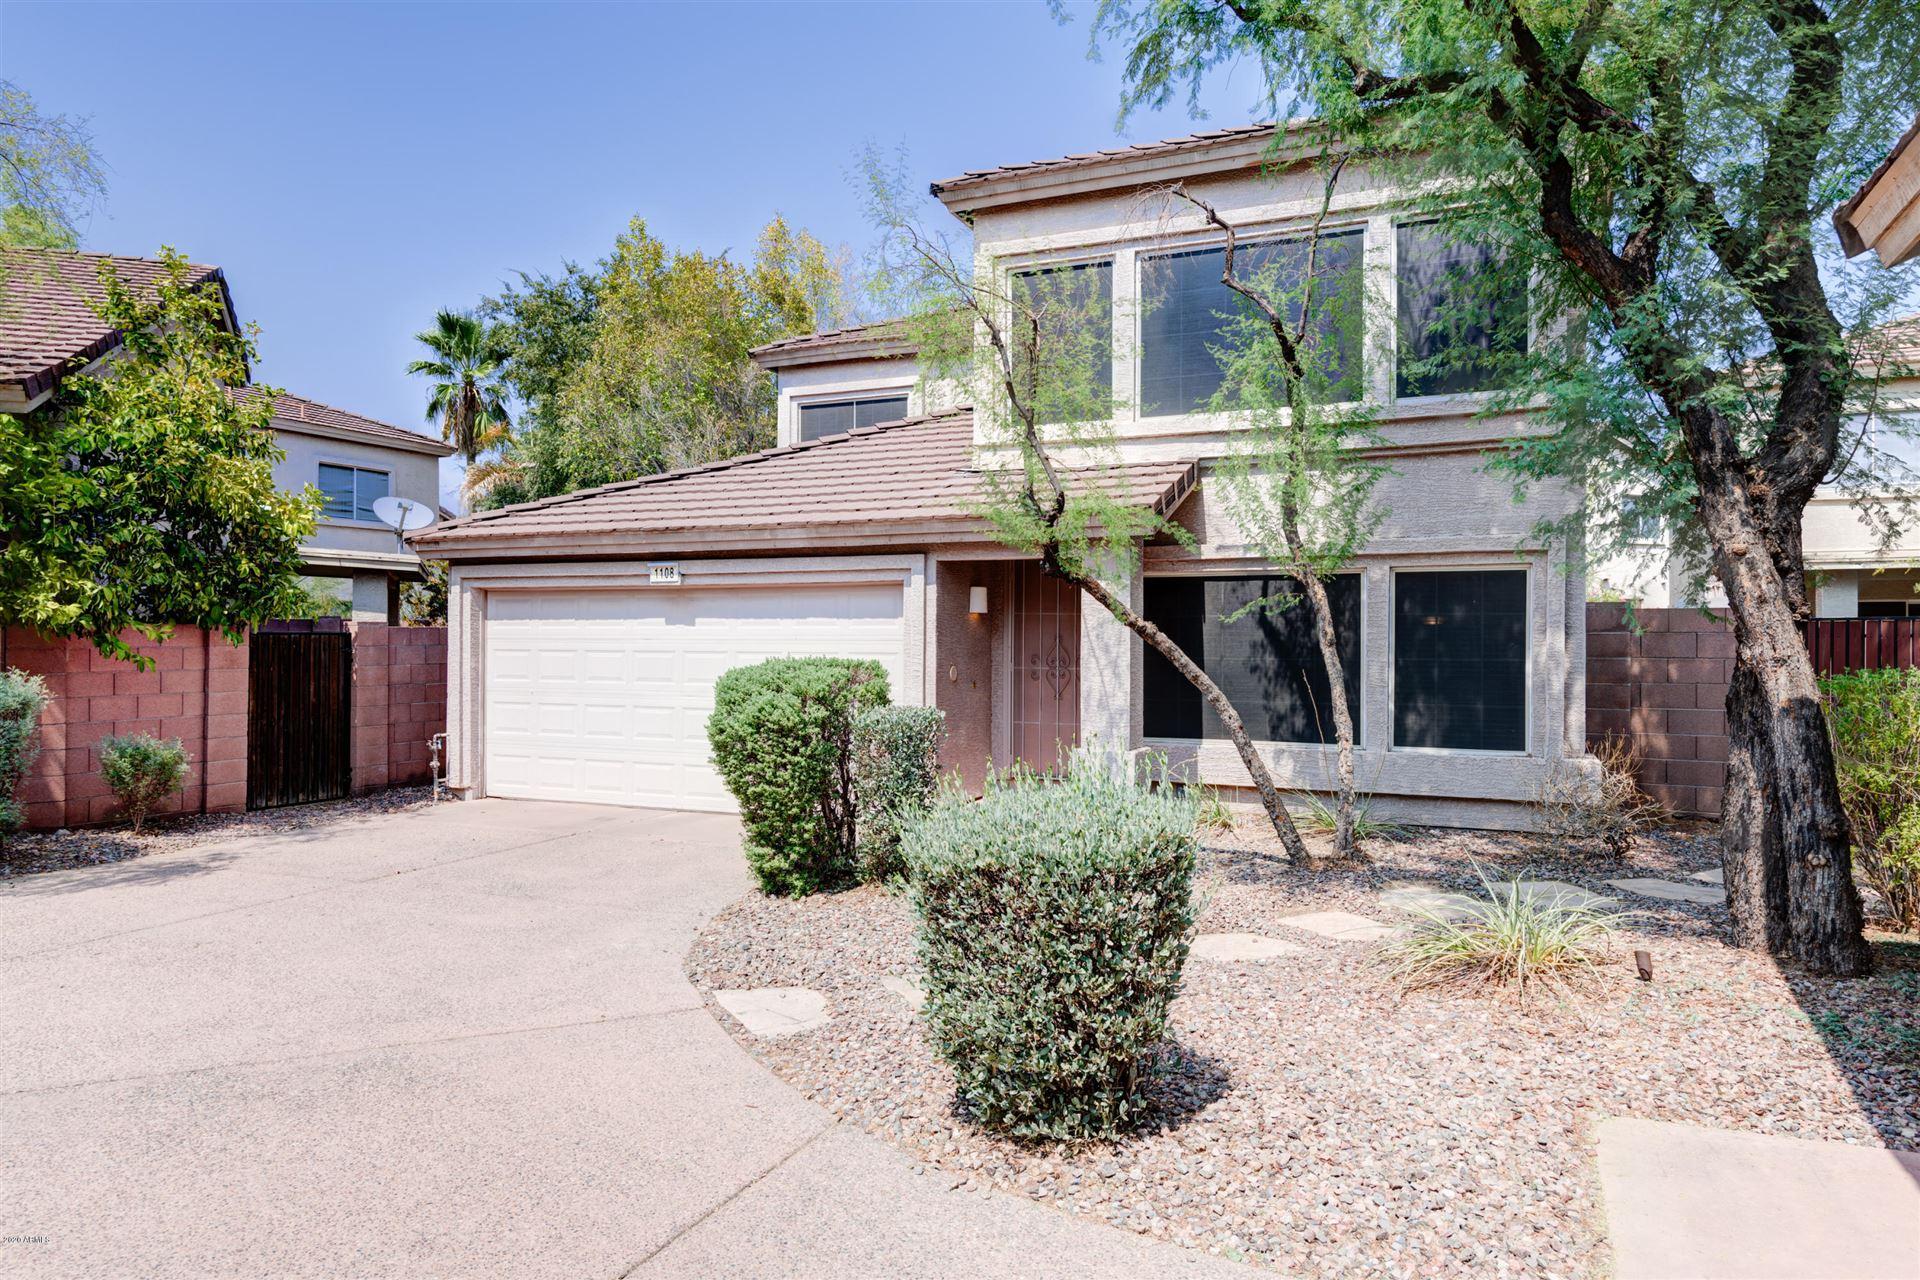 15550 N FRANK LLOYD WRIGHT Boulevard #1108, Scottsdale, AZ 85260 - MLS#: 6124429